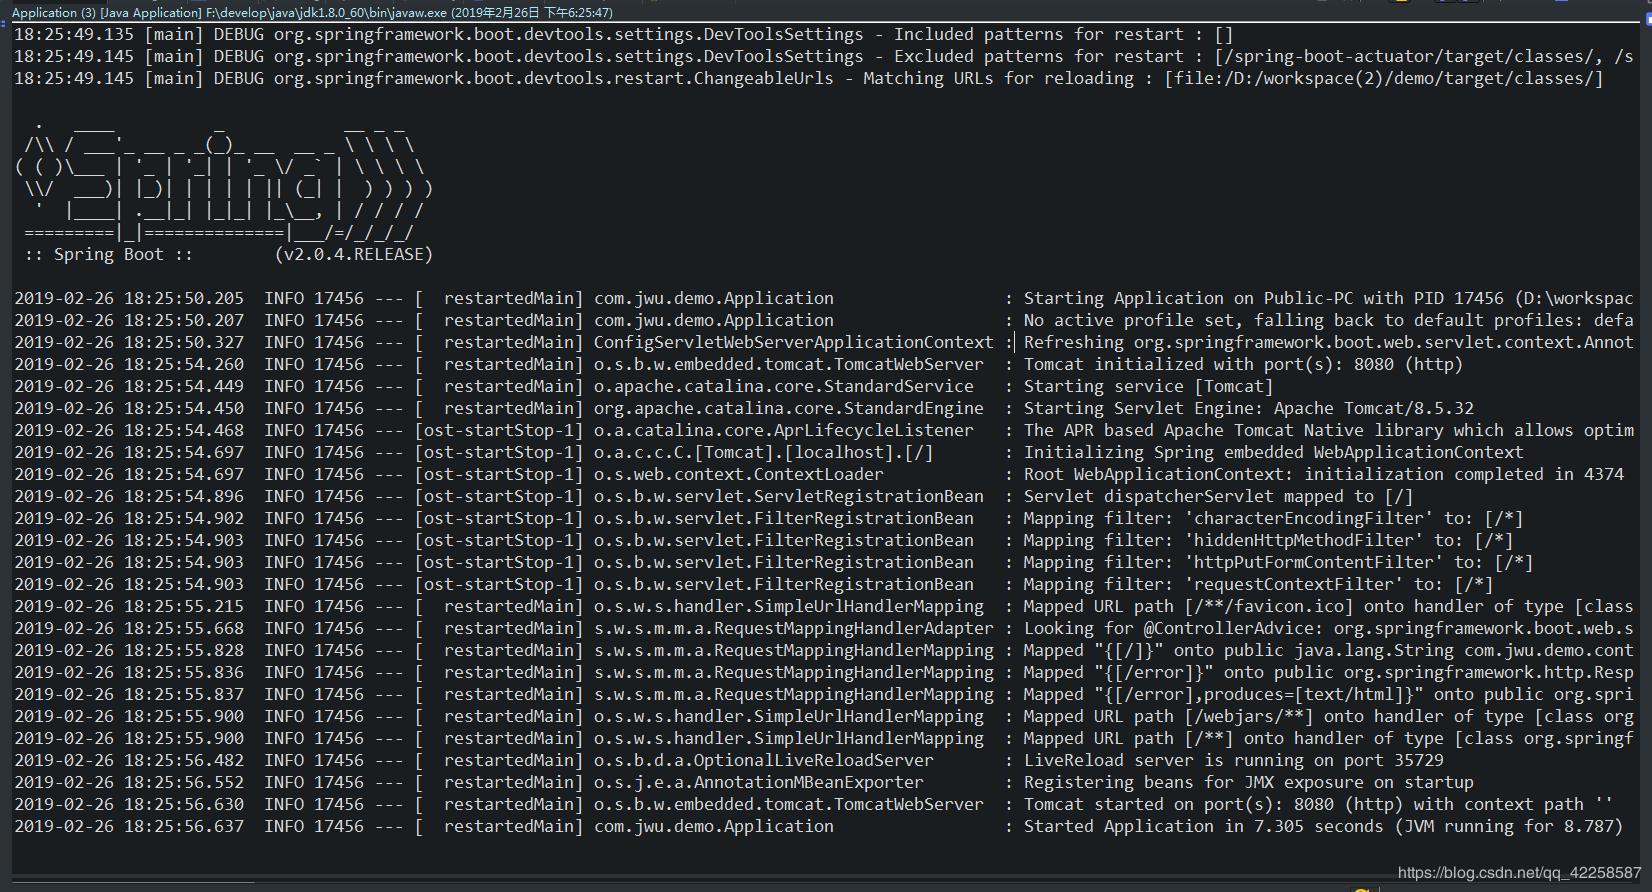 SpringBoot integration mybatis+PegeHelper paging plugin +redis+kafka